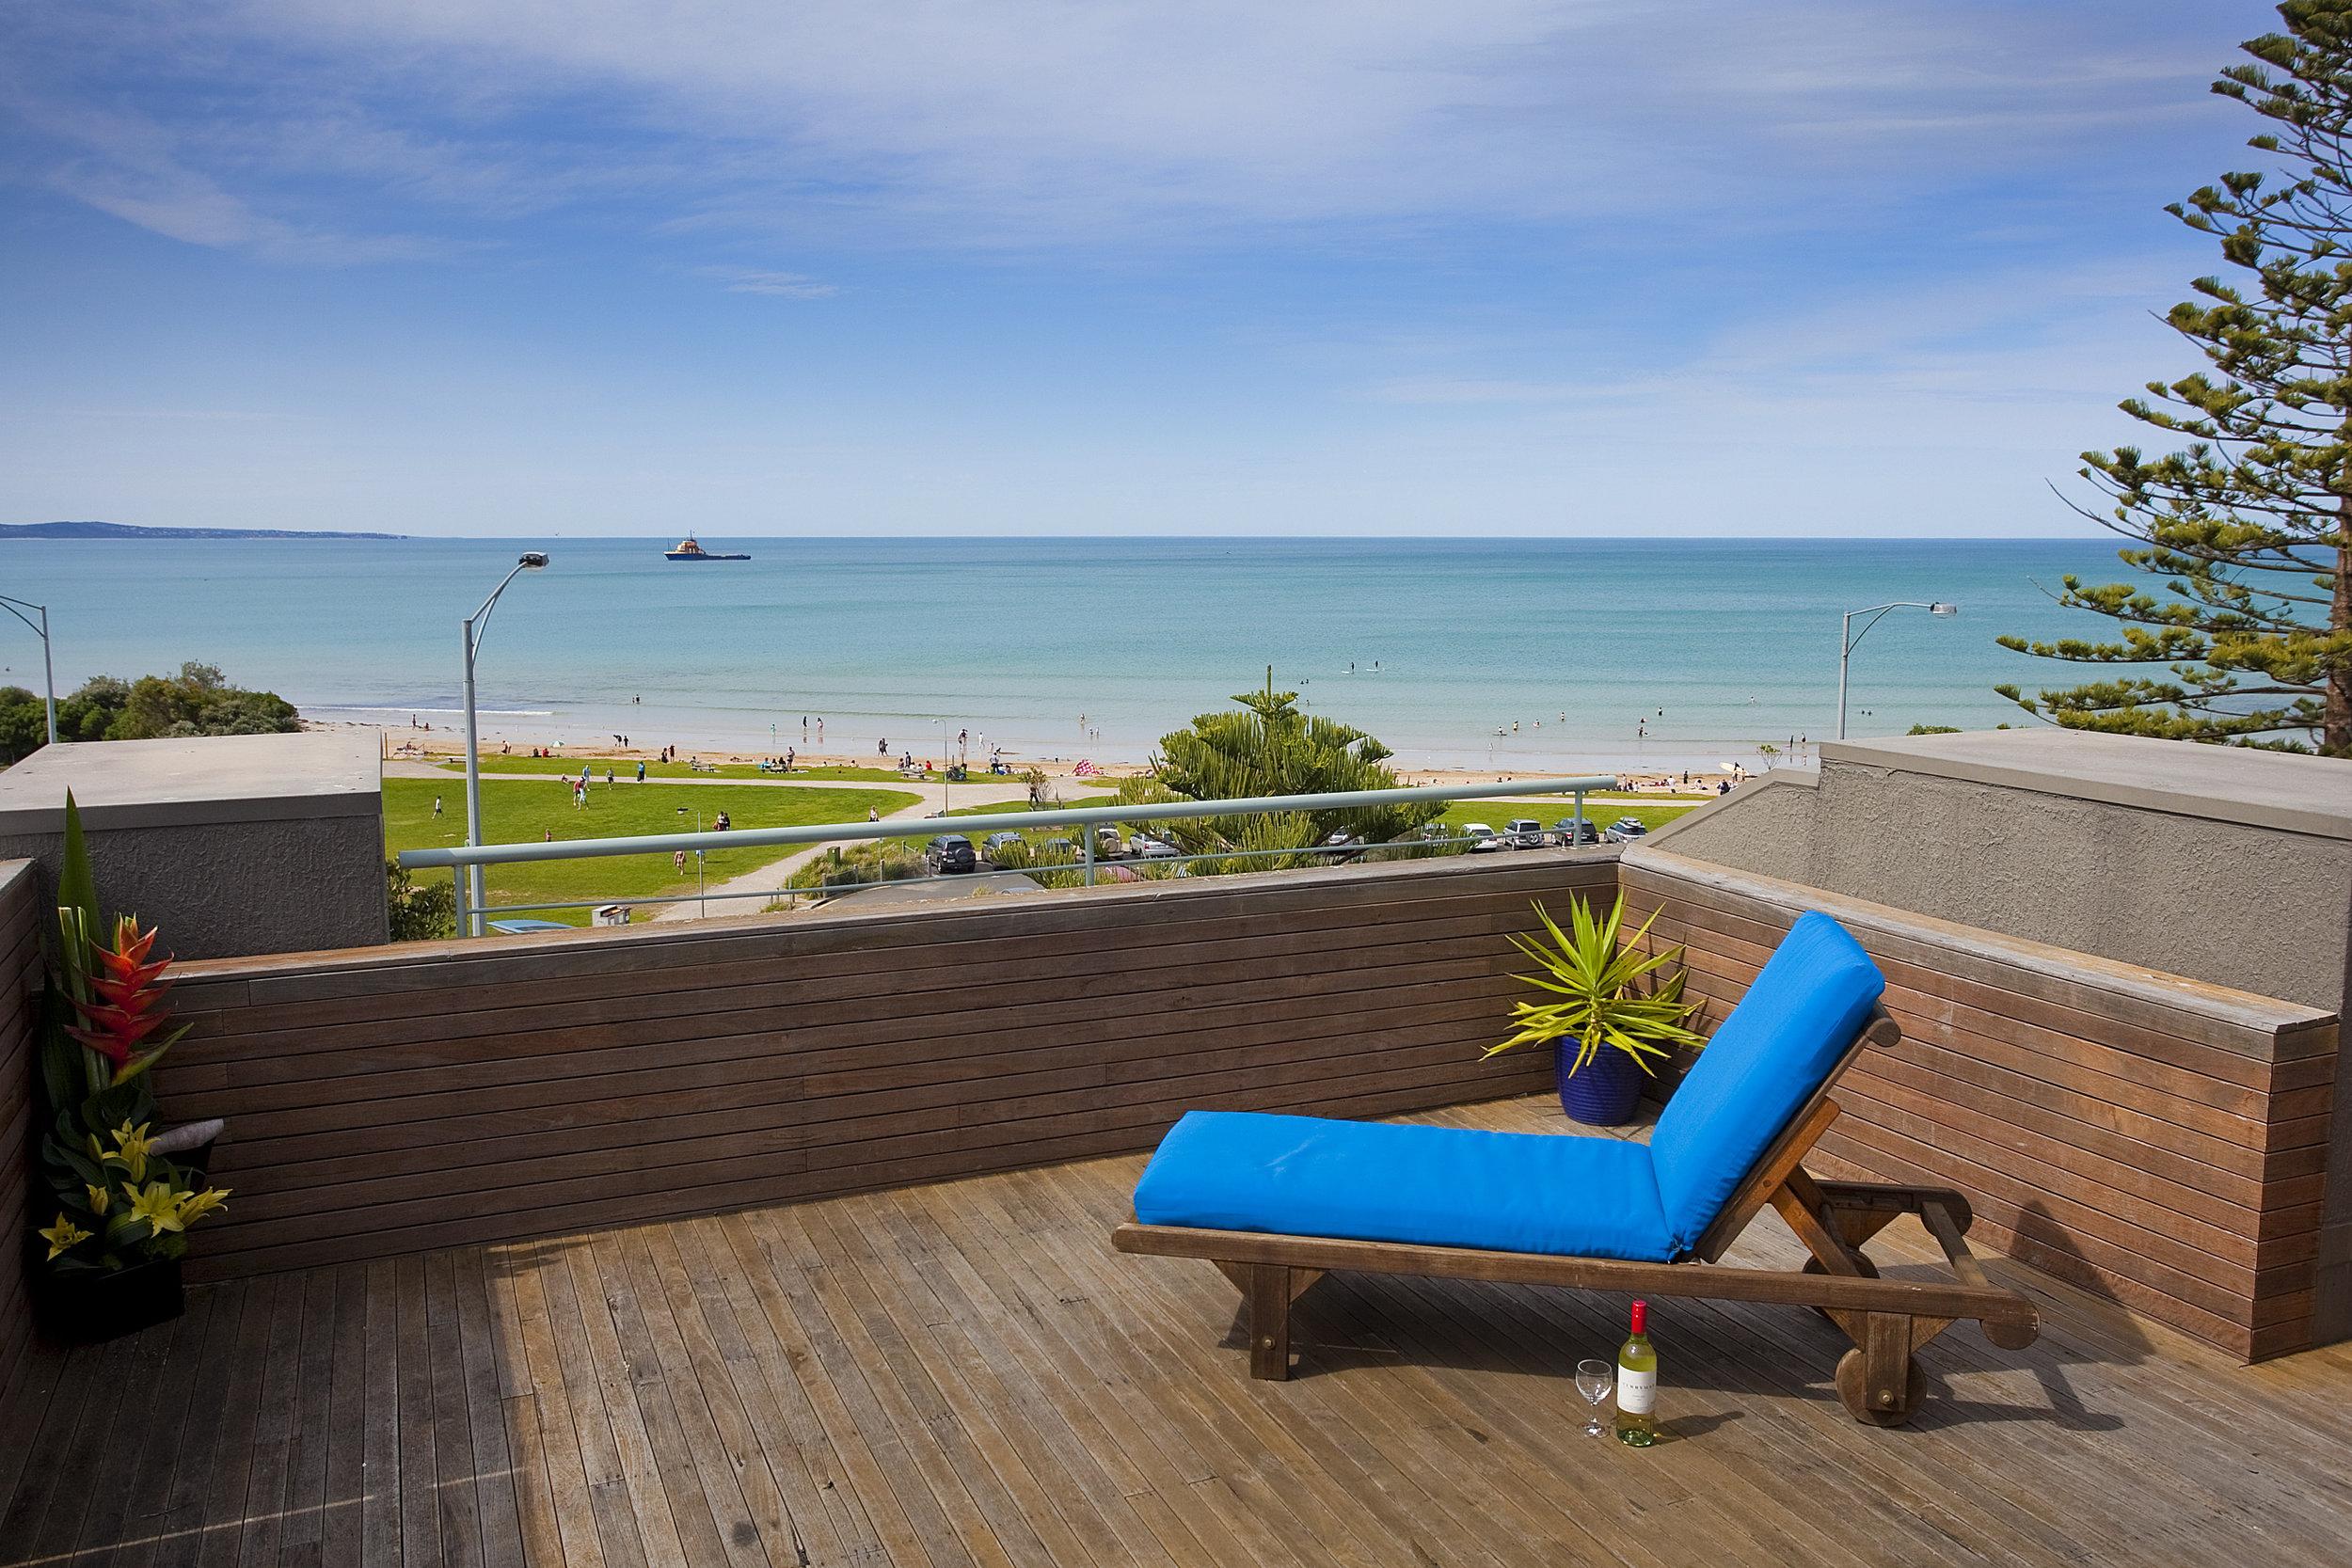 penthouse deck.jpg